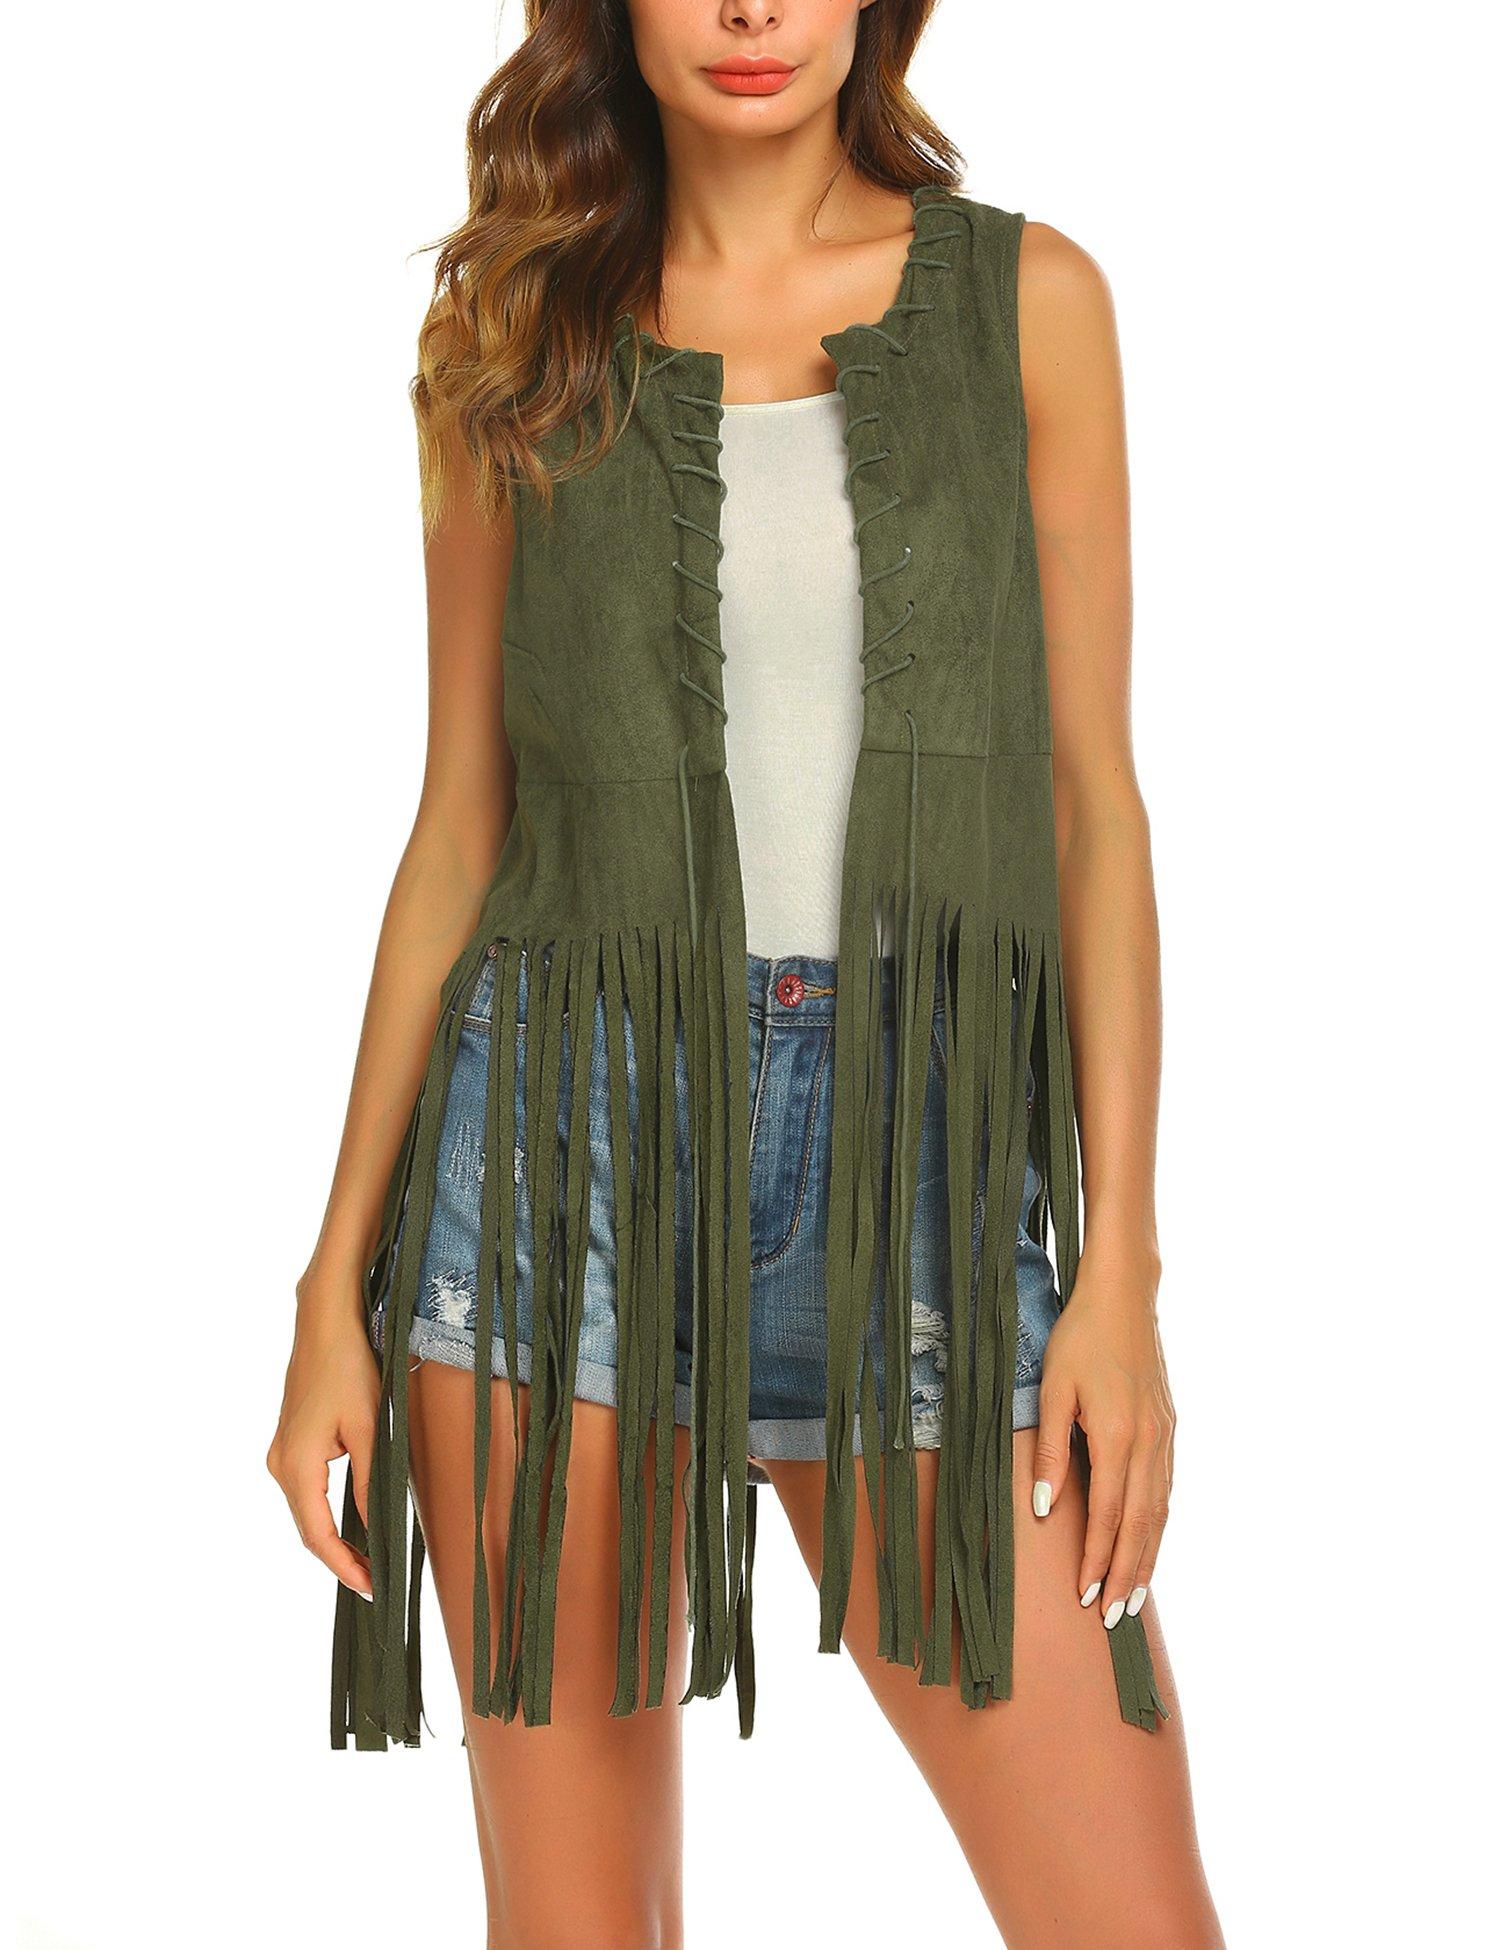 Women 70s Fringe Vest Faux Suede Tassels Vest Hippie Clothes Open Front Sleeveless Cardigan Female